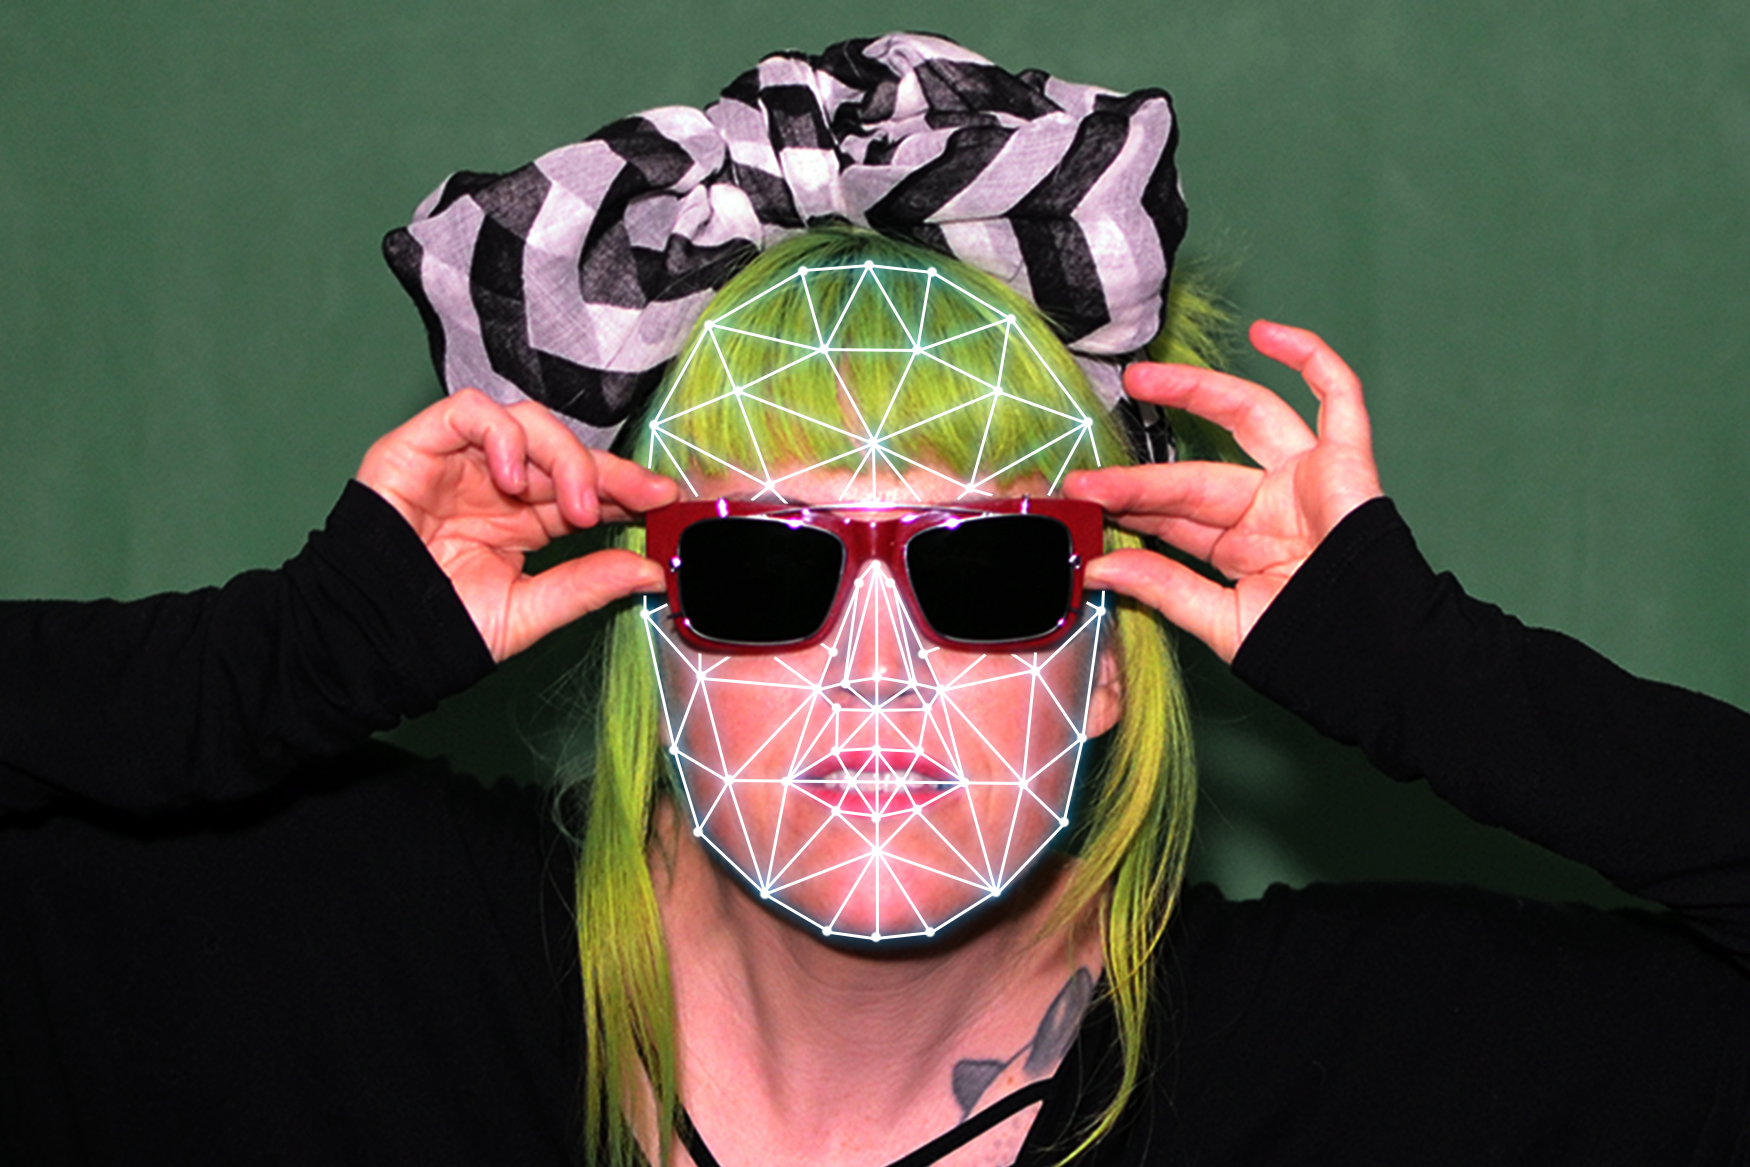 irpair-phantom-3d-facial-mapping-recognition-eyewear-sunglasses.jpg